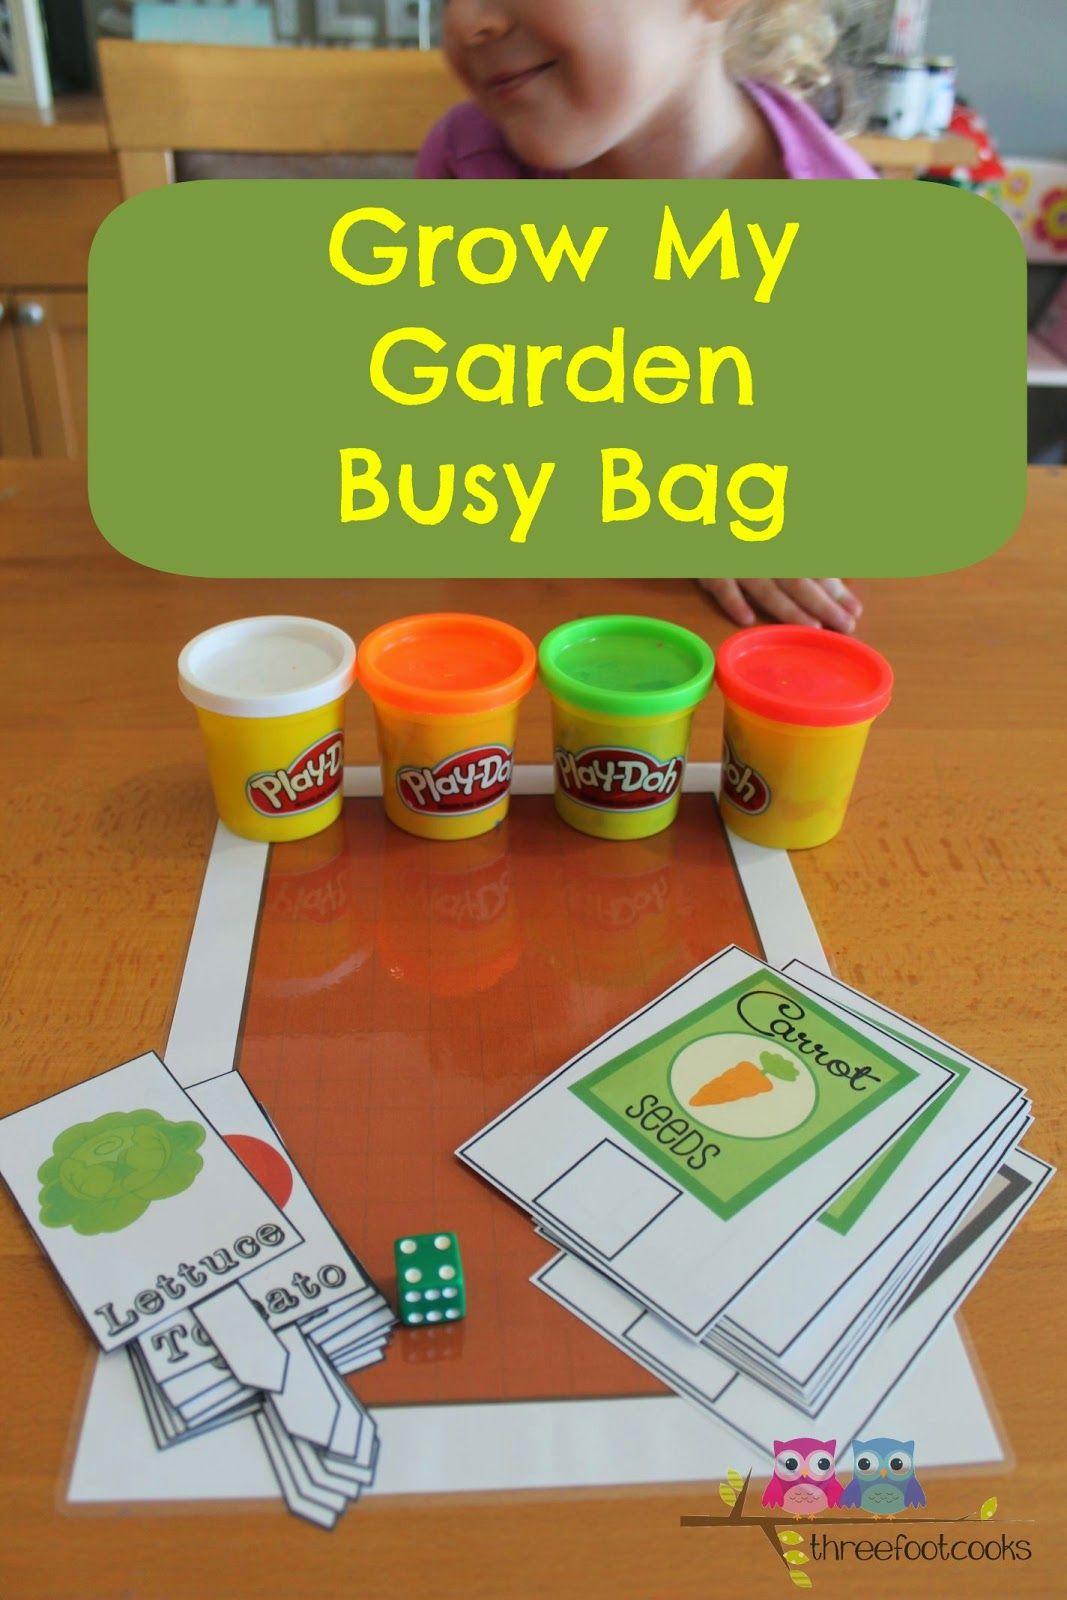 Grow My Garden Busy Bag